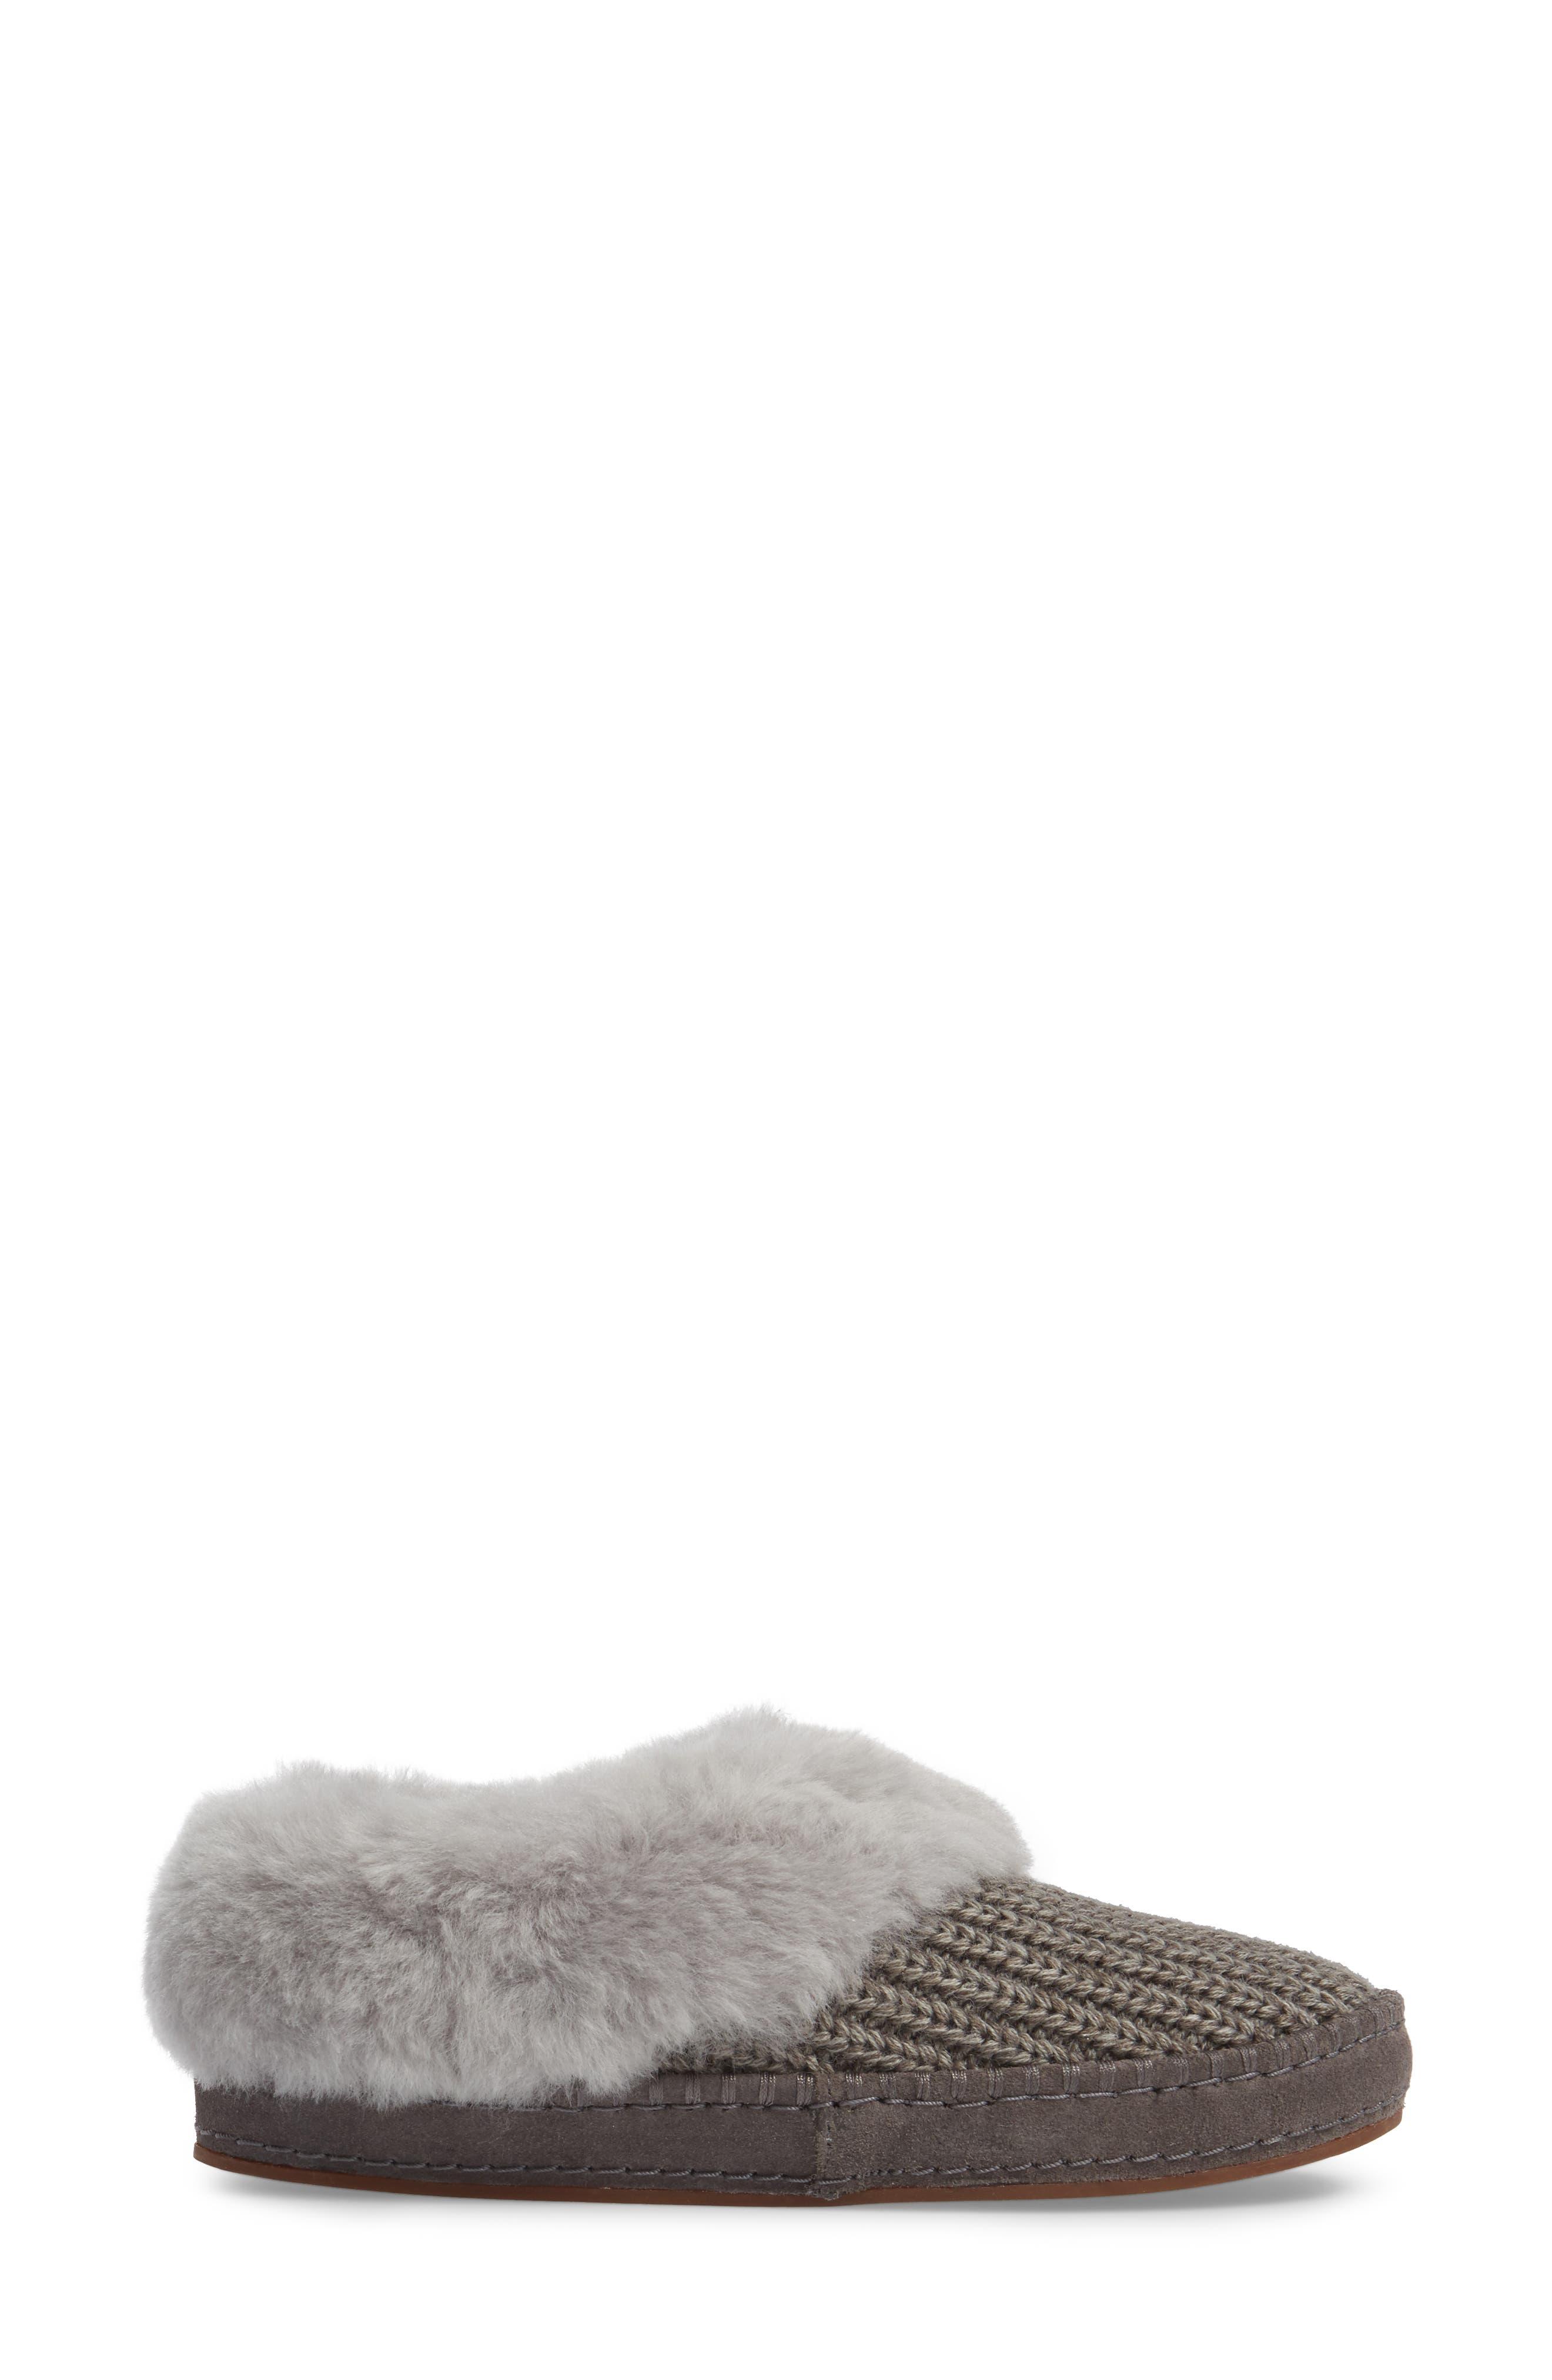 Alternate Image 3  - UGG® Wrin Rib-Knit & Genuine Shearling Slipper (Women)